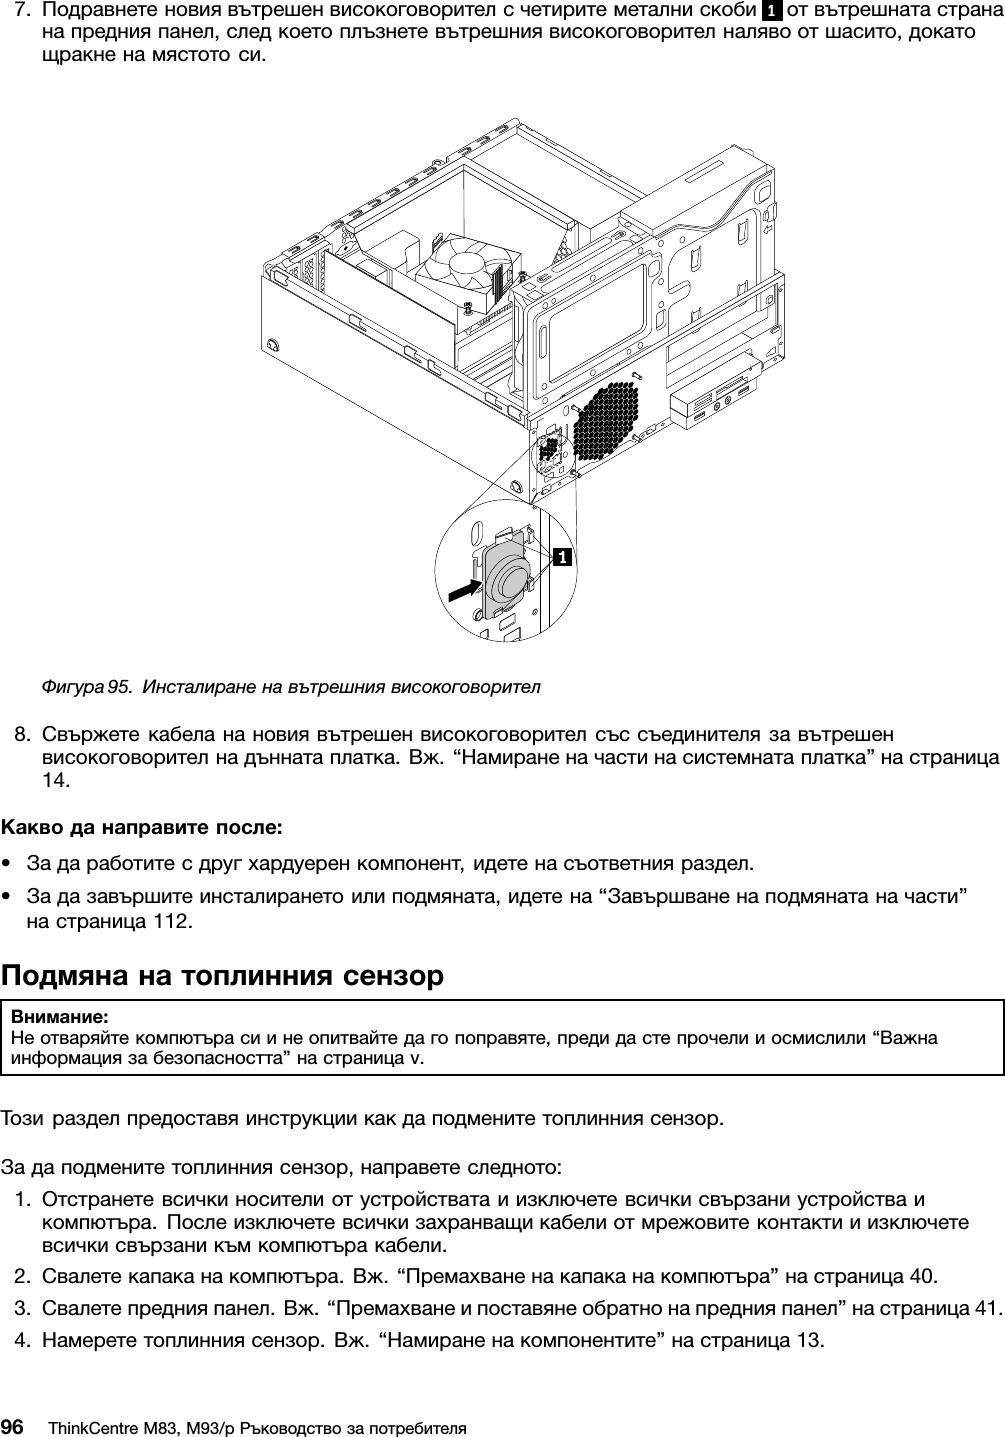 b8f3b4e053b Lenovo M83M93P Sff Ug Bg User Manual (Bulgarian) Guide (Small Form Factor)  M83 Desktop (Think Centre) Type 10E8